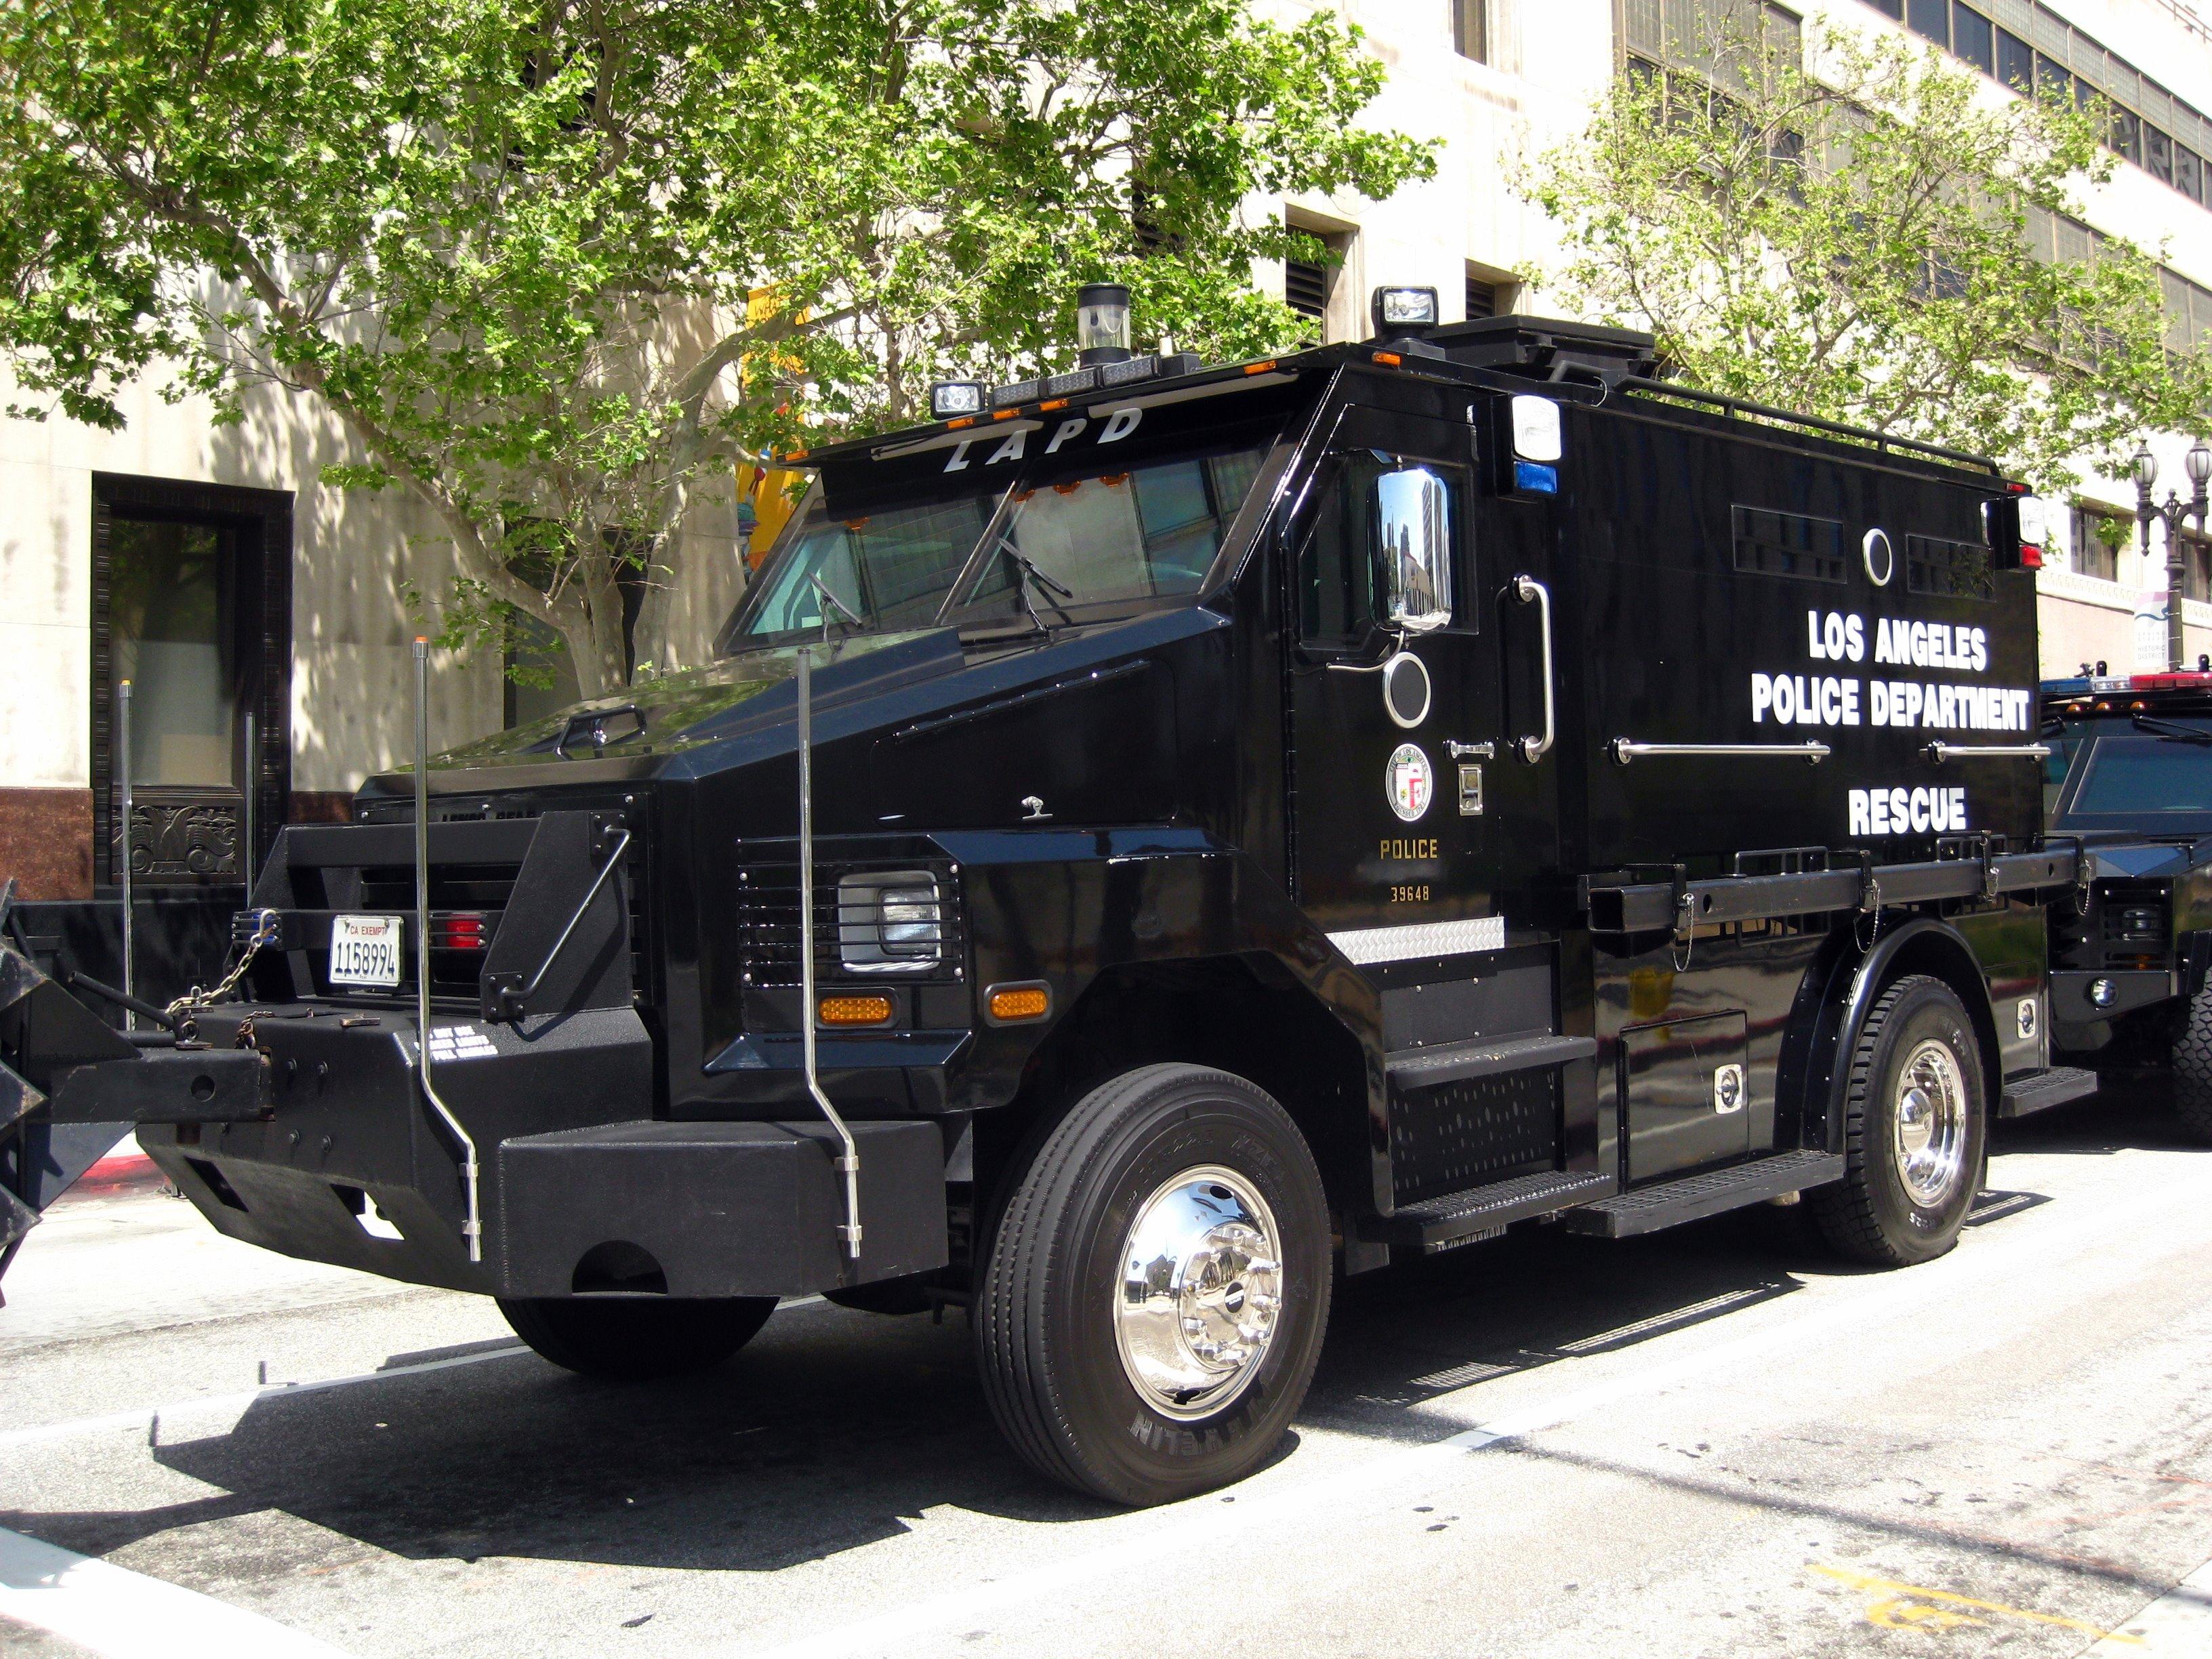 LAPD_SWAT_Rescue_vehicle.jpg